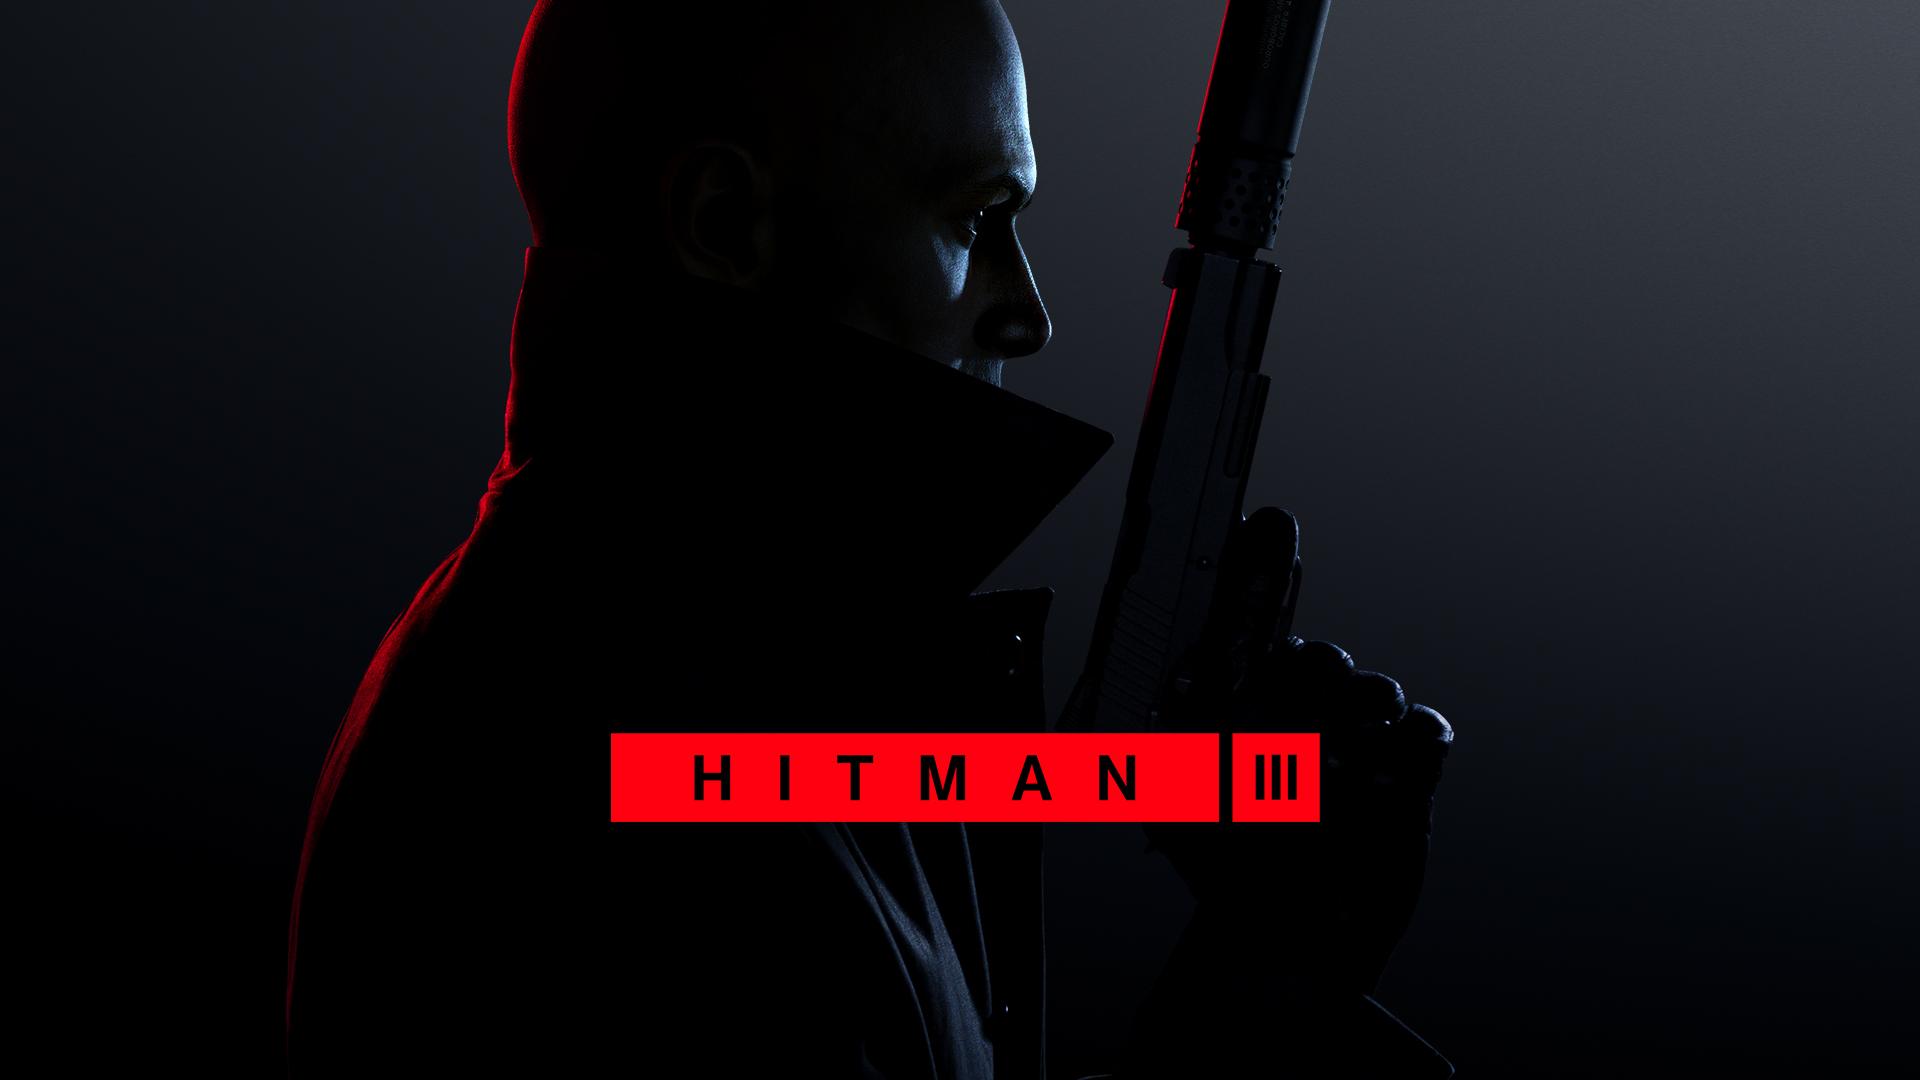 GAMES RELEASING IN JANUARY 2021, HITMAN 3